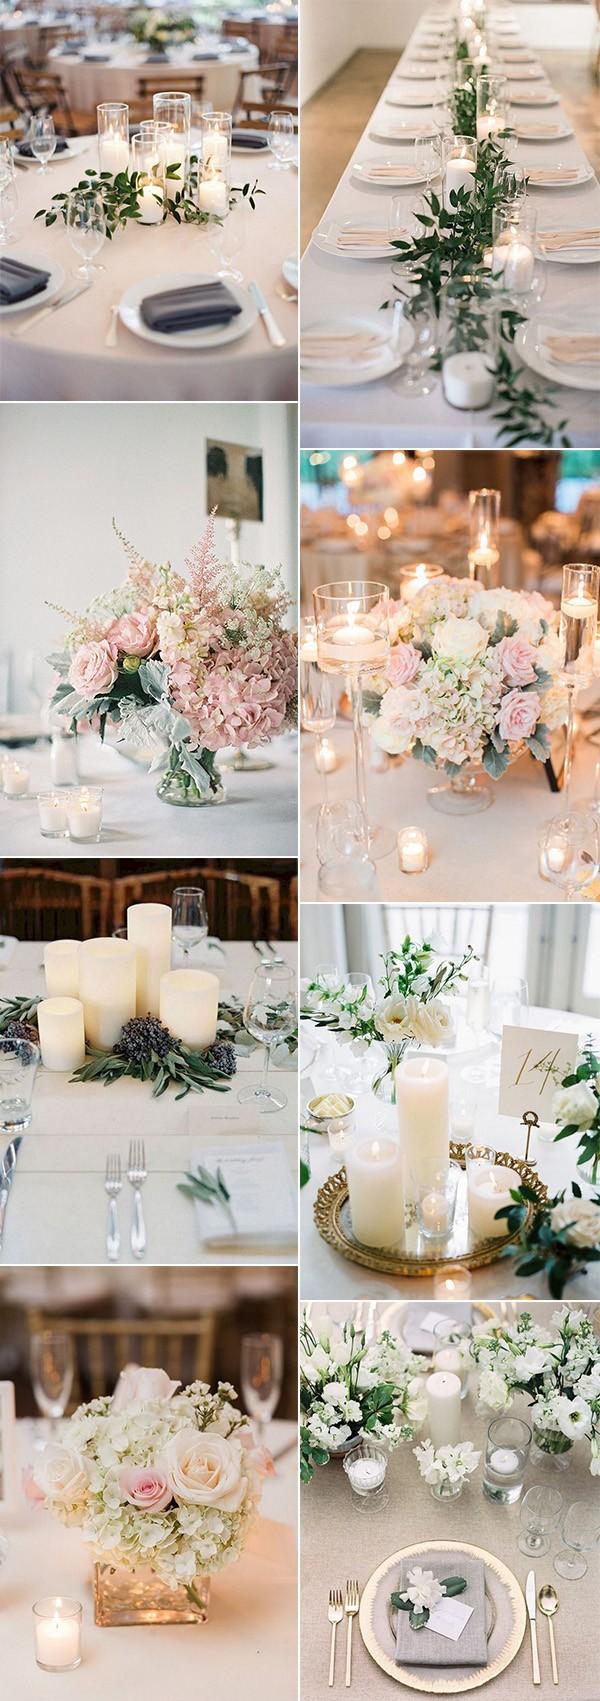 trending elegant wedding centerpiece ideas for 2018 trends